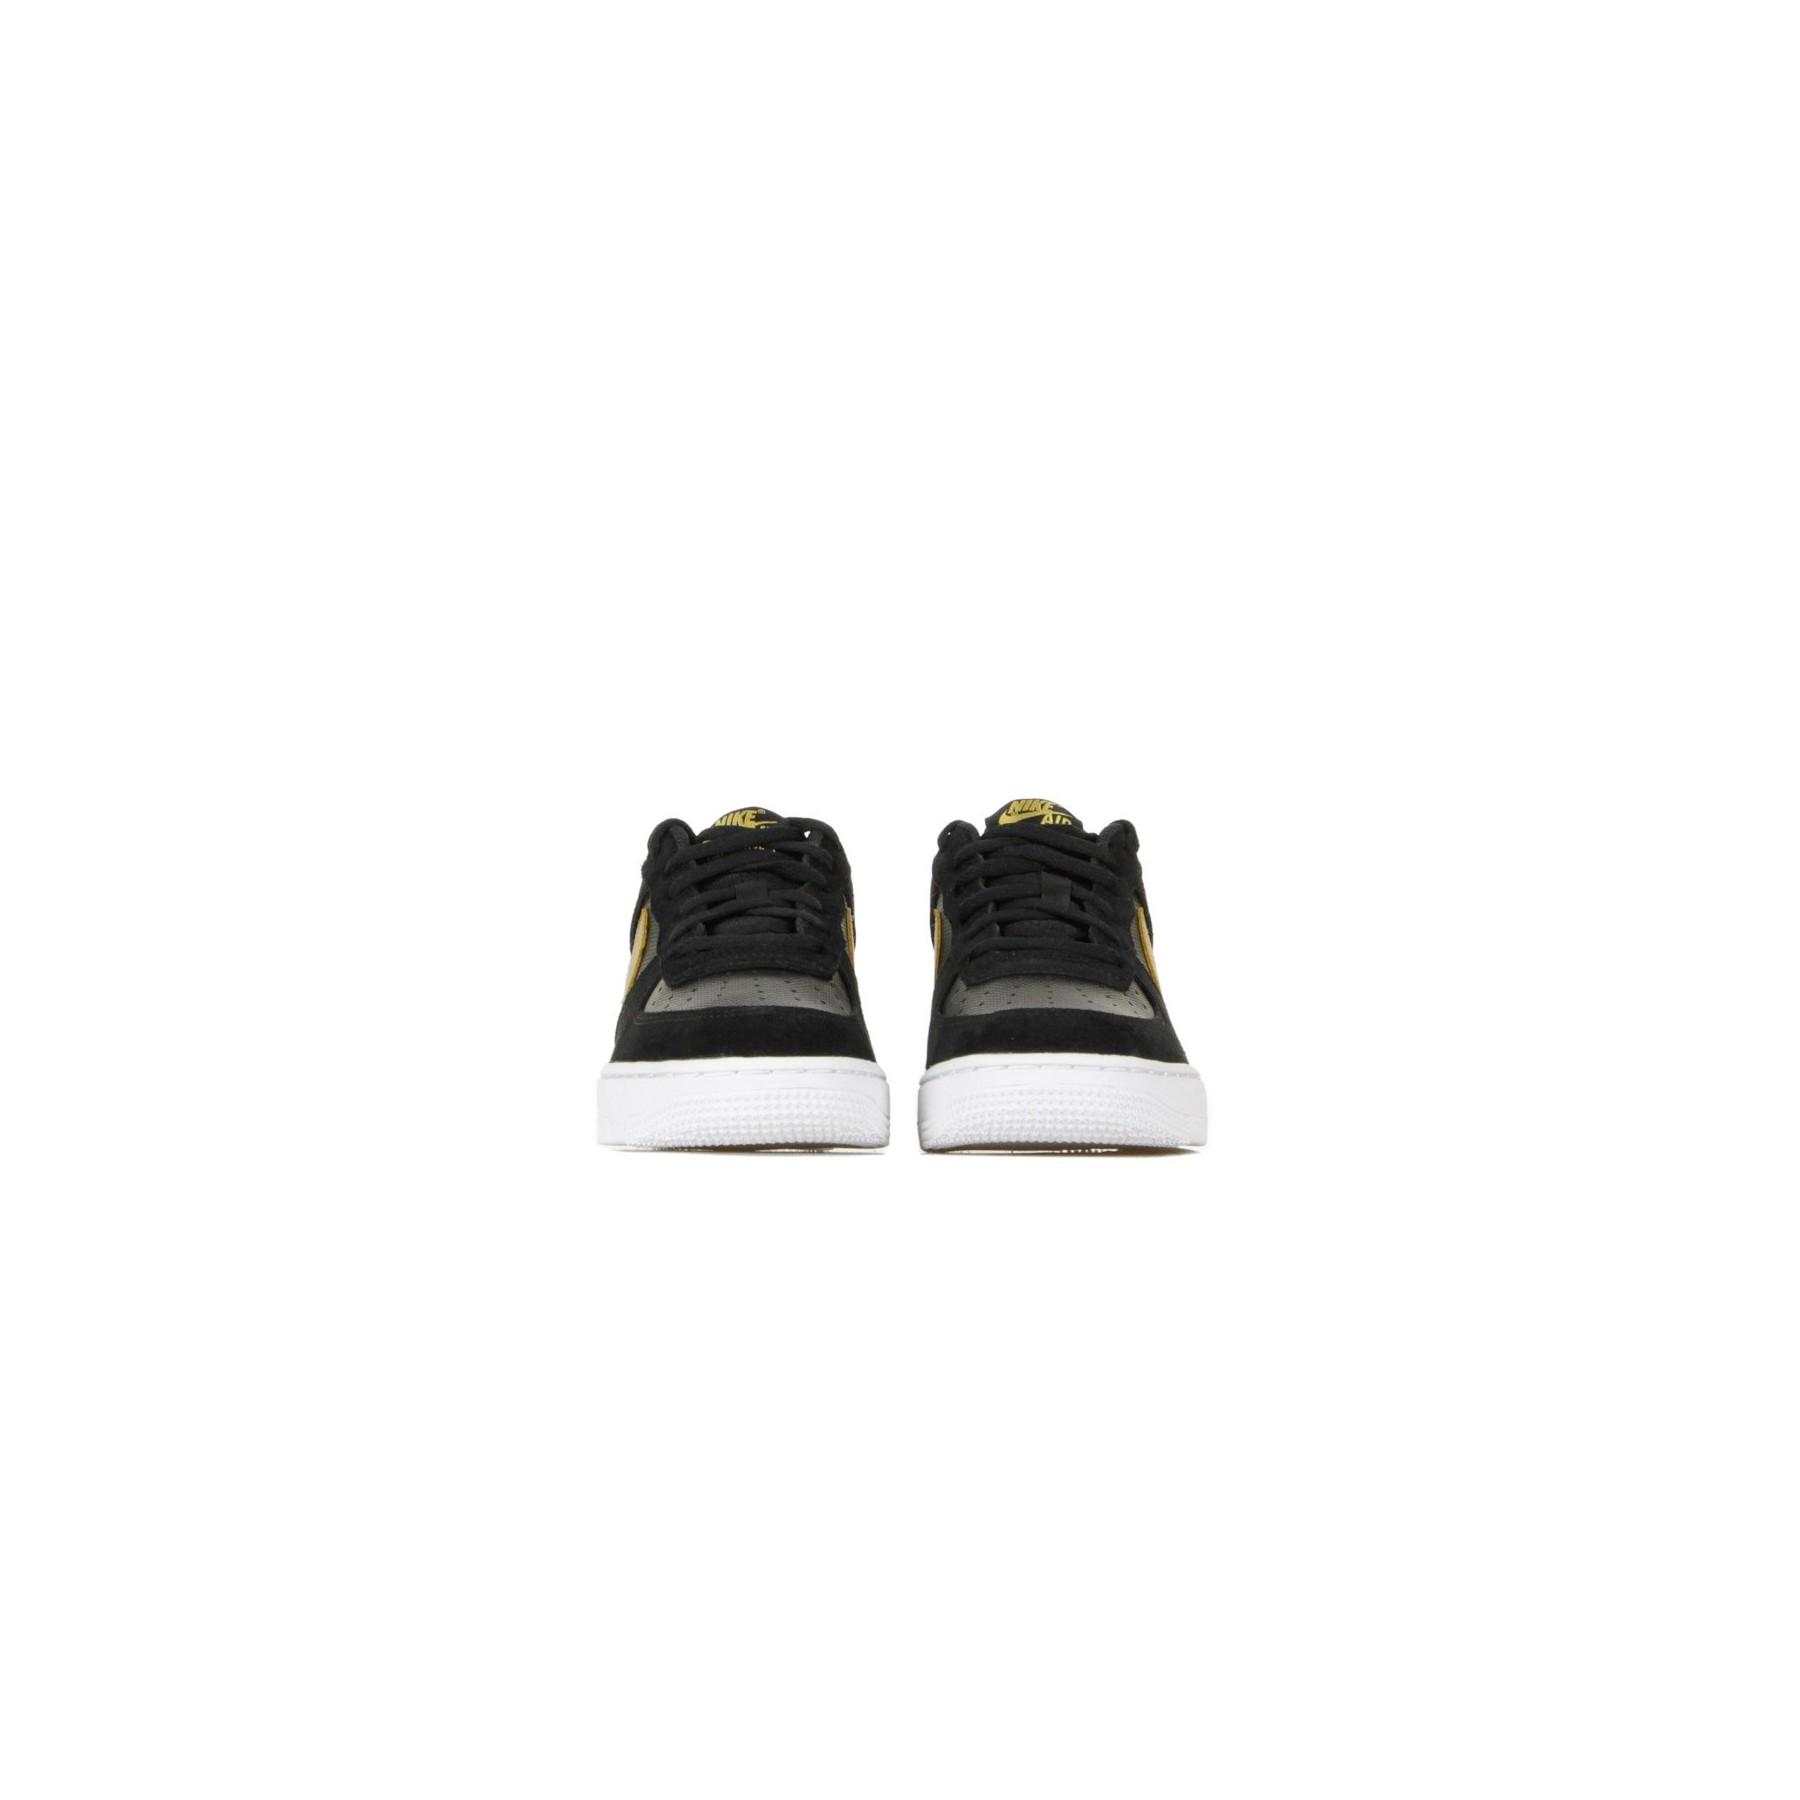 Nike Air Force 1 High SL ( 919473 600 ) OVERKILL Berlin